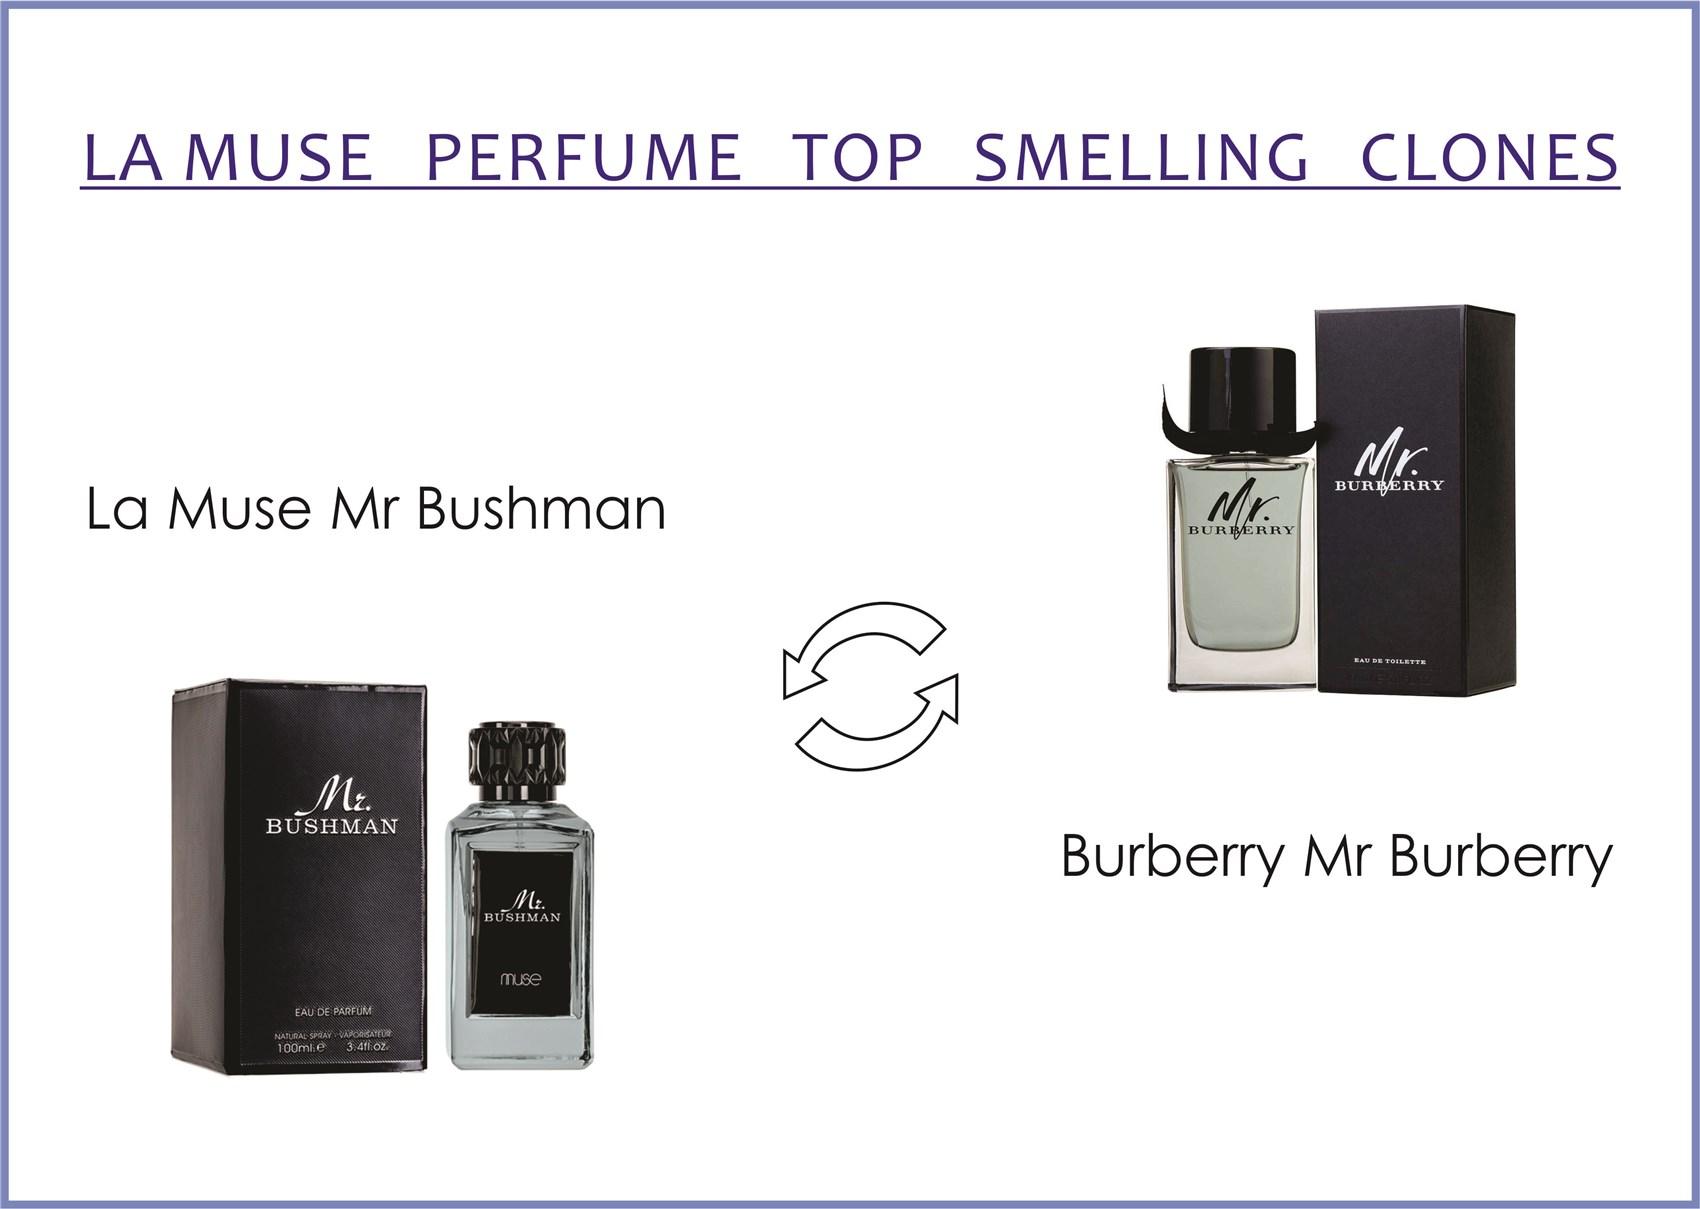 la-muse-mr-bushman-for-men-100-ml-edp-by-lattafa-perfumes-burberry-mr-burberry-indigo-perfume-for-men-100-ml-edt